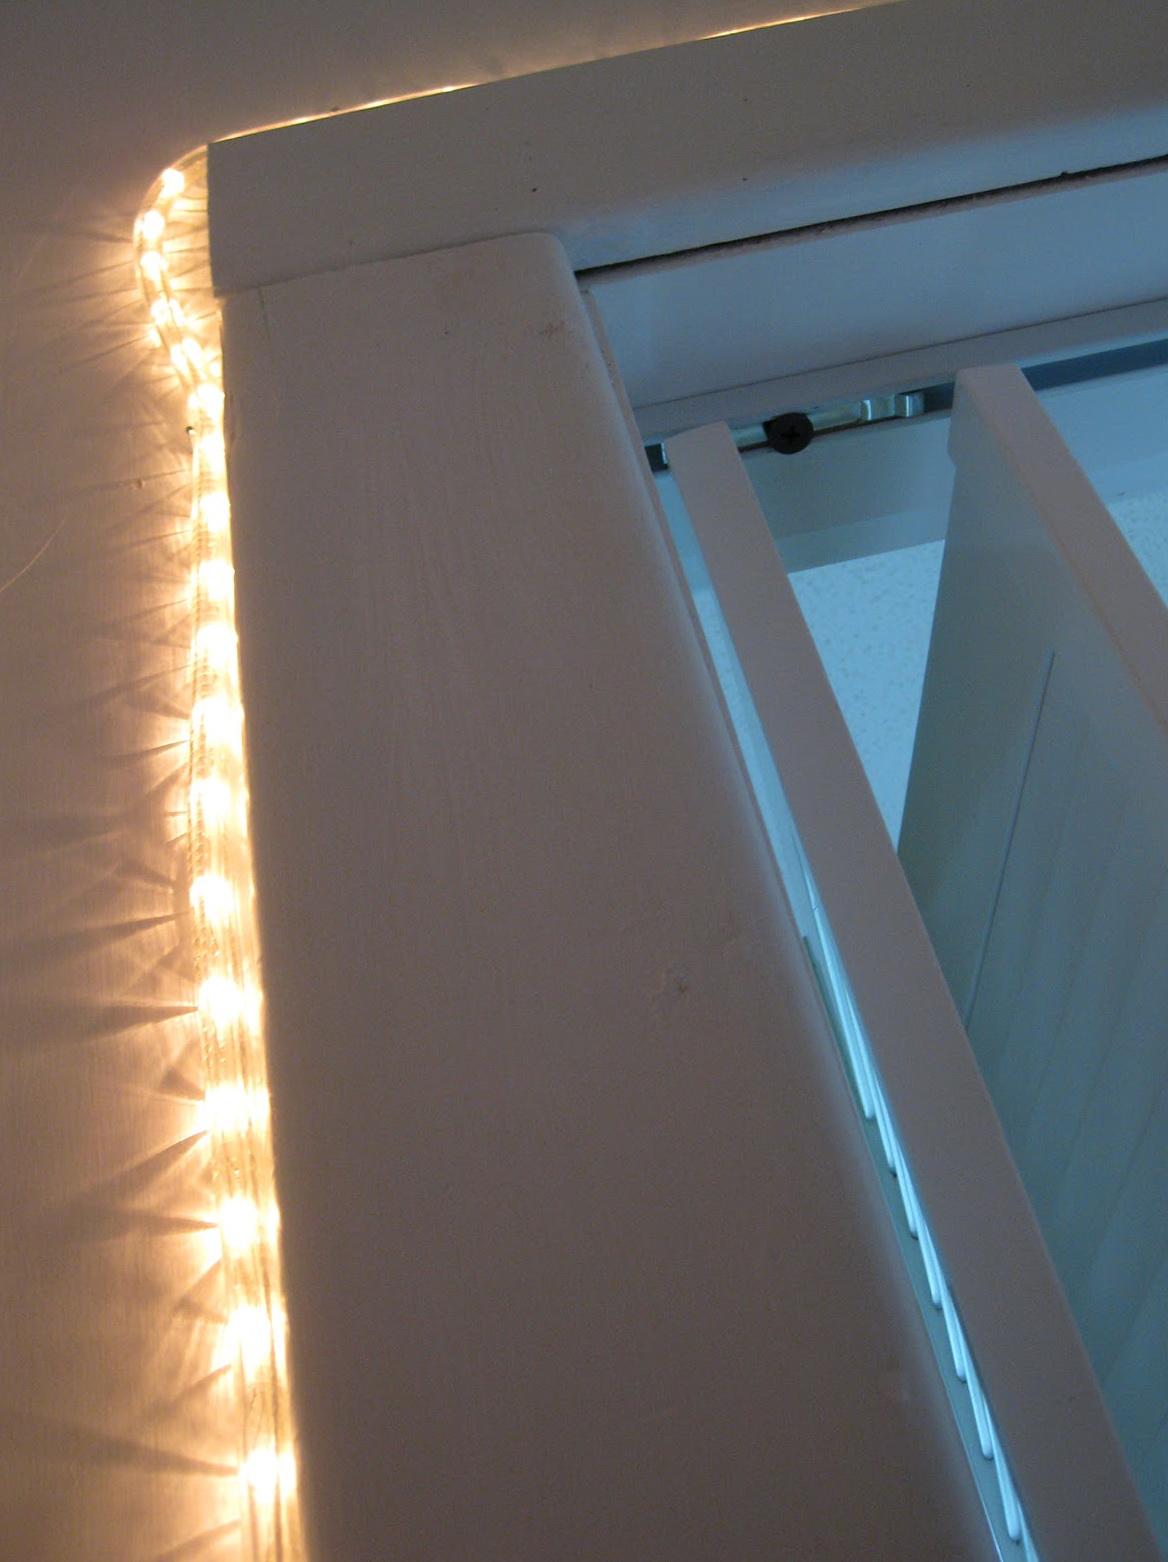 Closet Light Switch Location